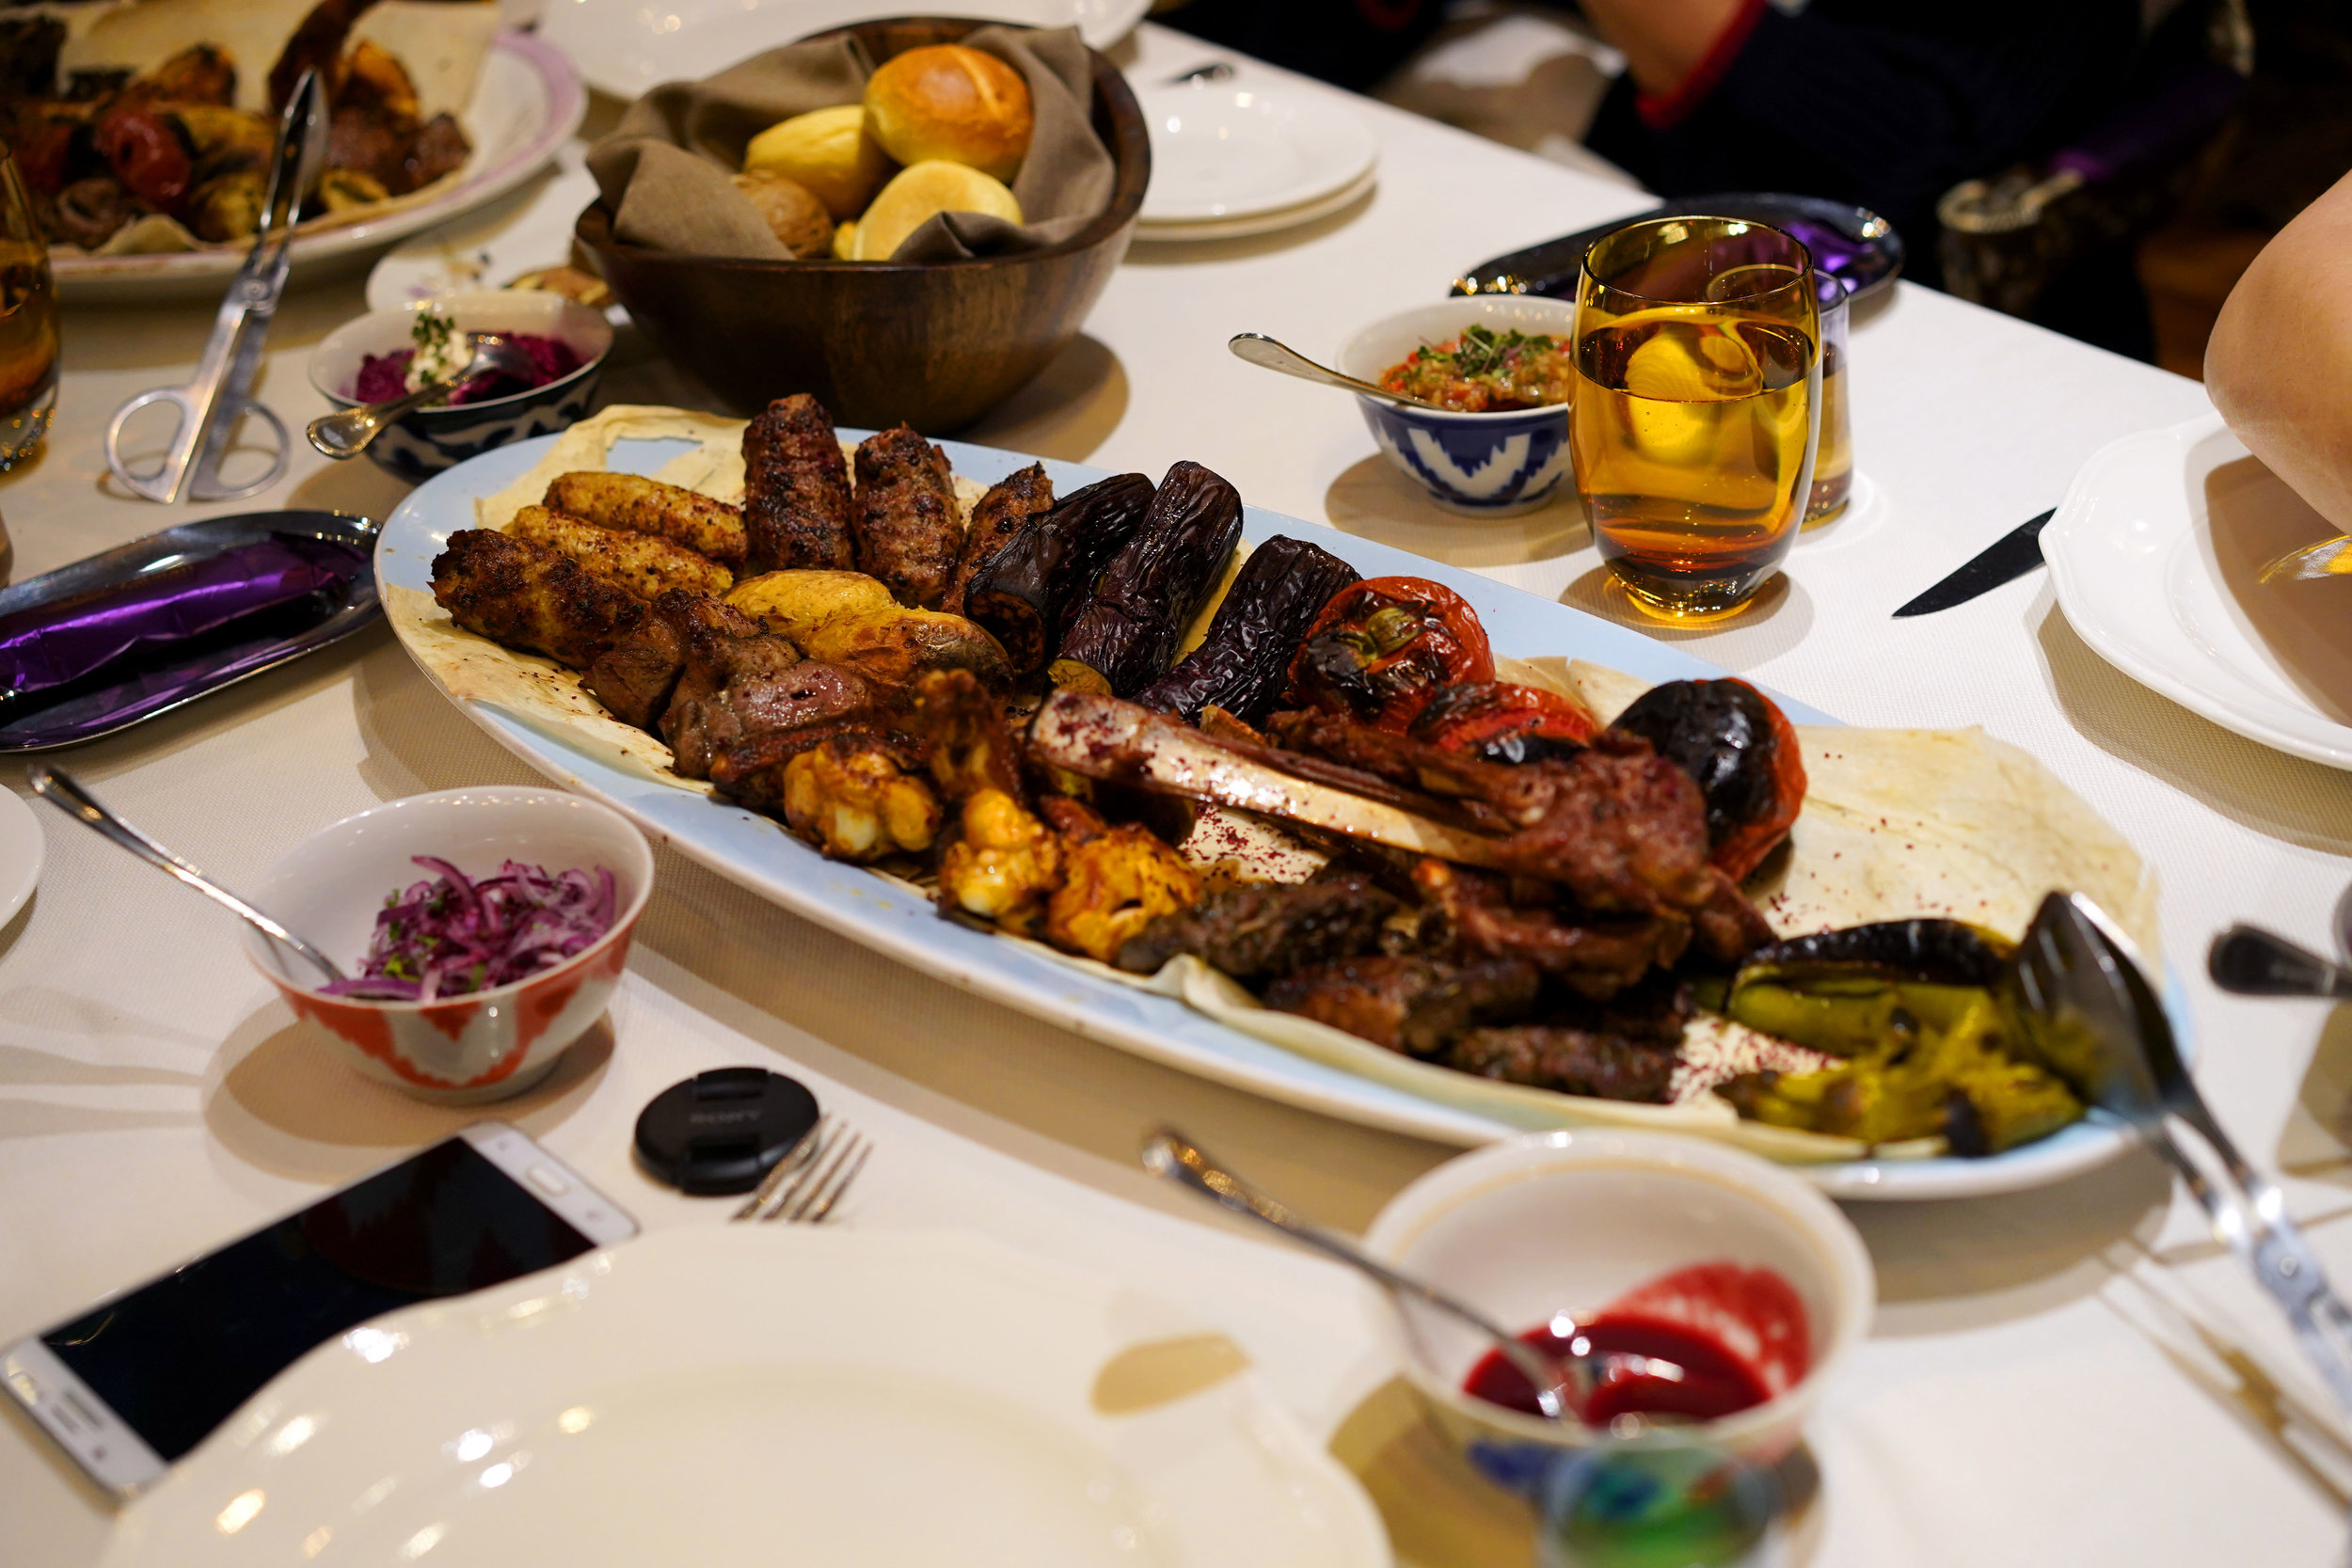 thetravelhub_istanbul_food2.JPG